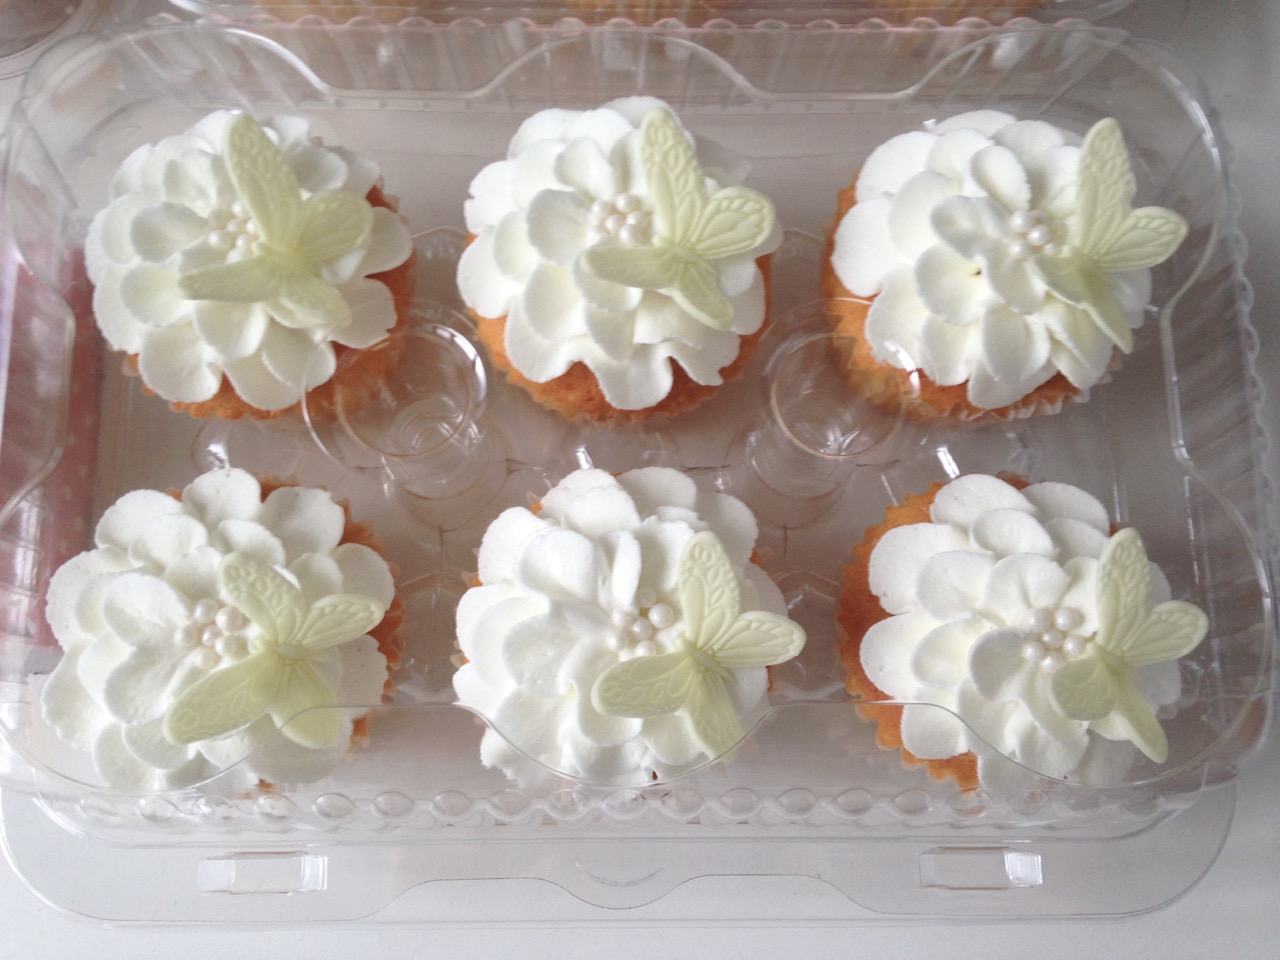 20150721-cupcake0604-1